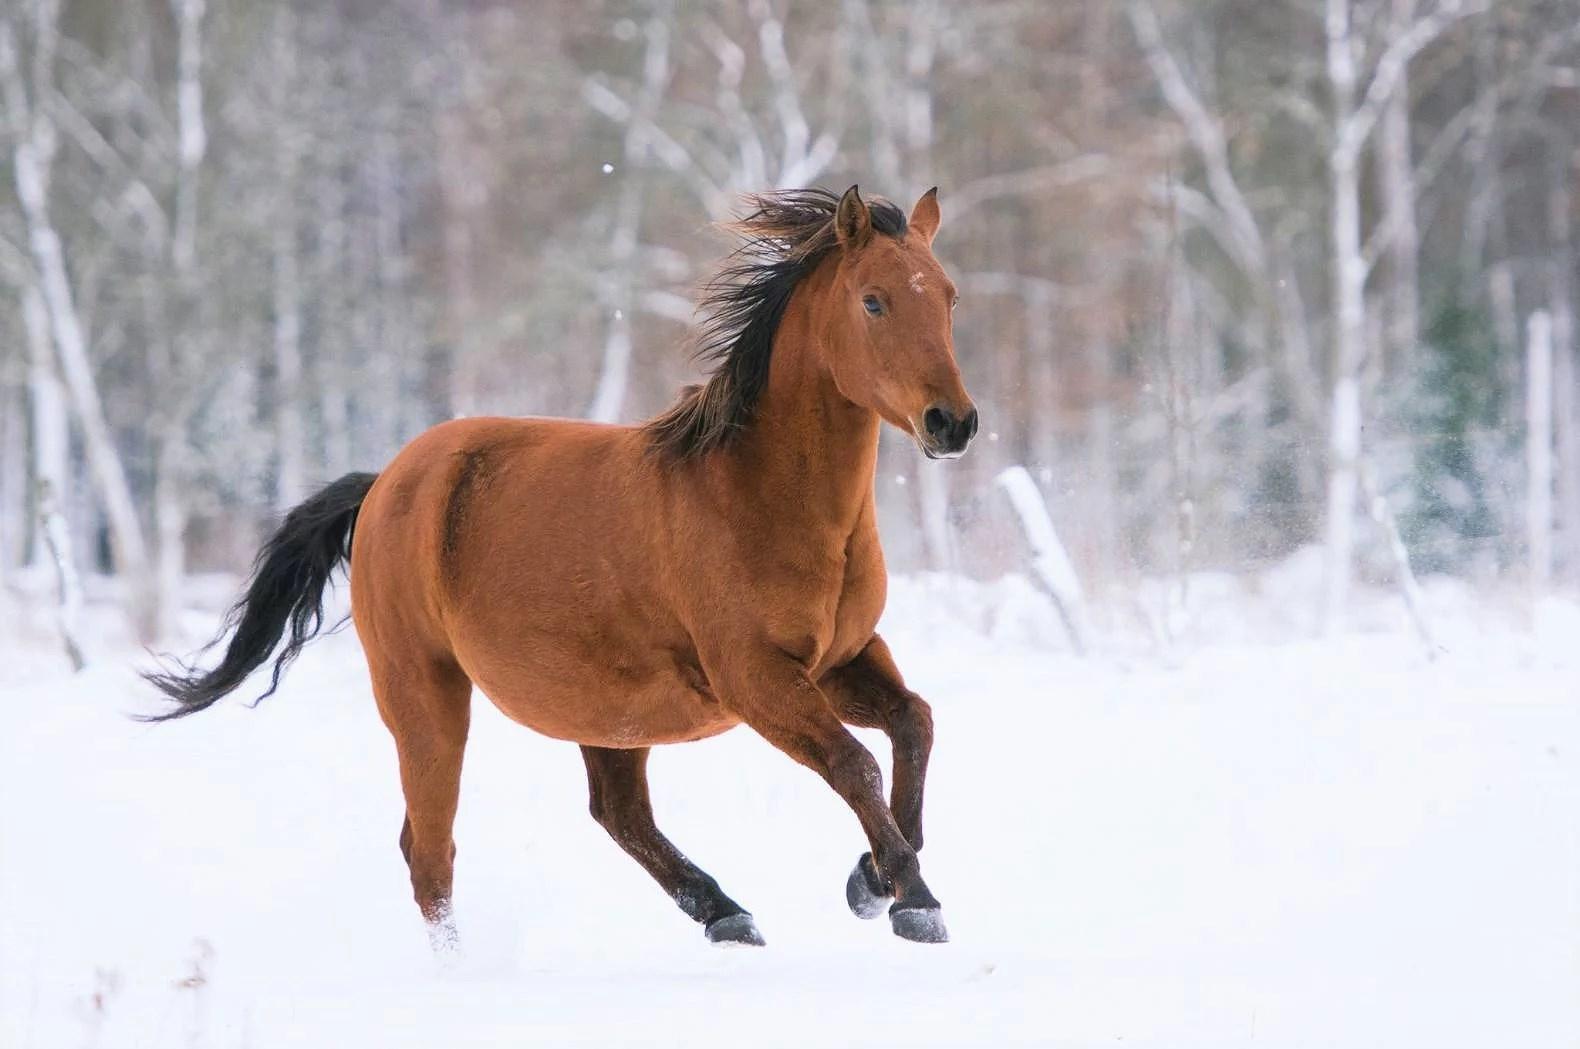 Mina ponnyer